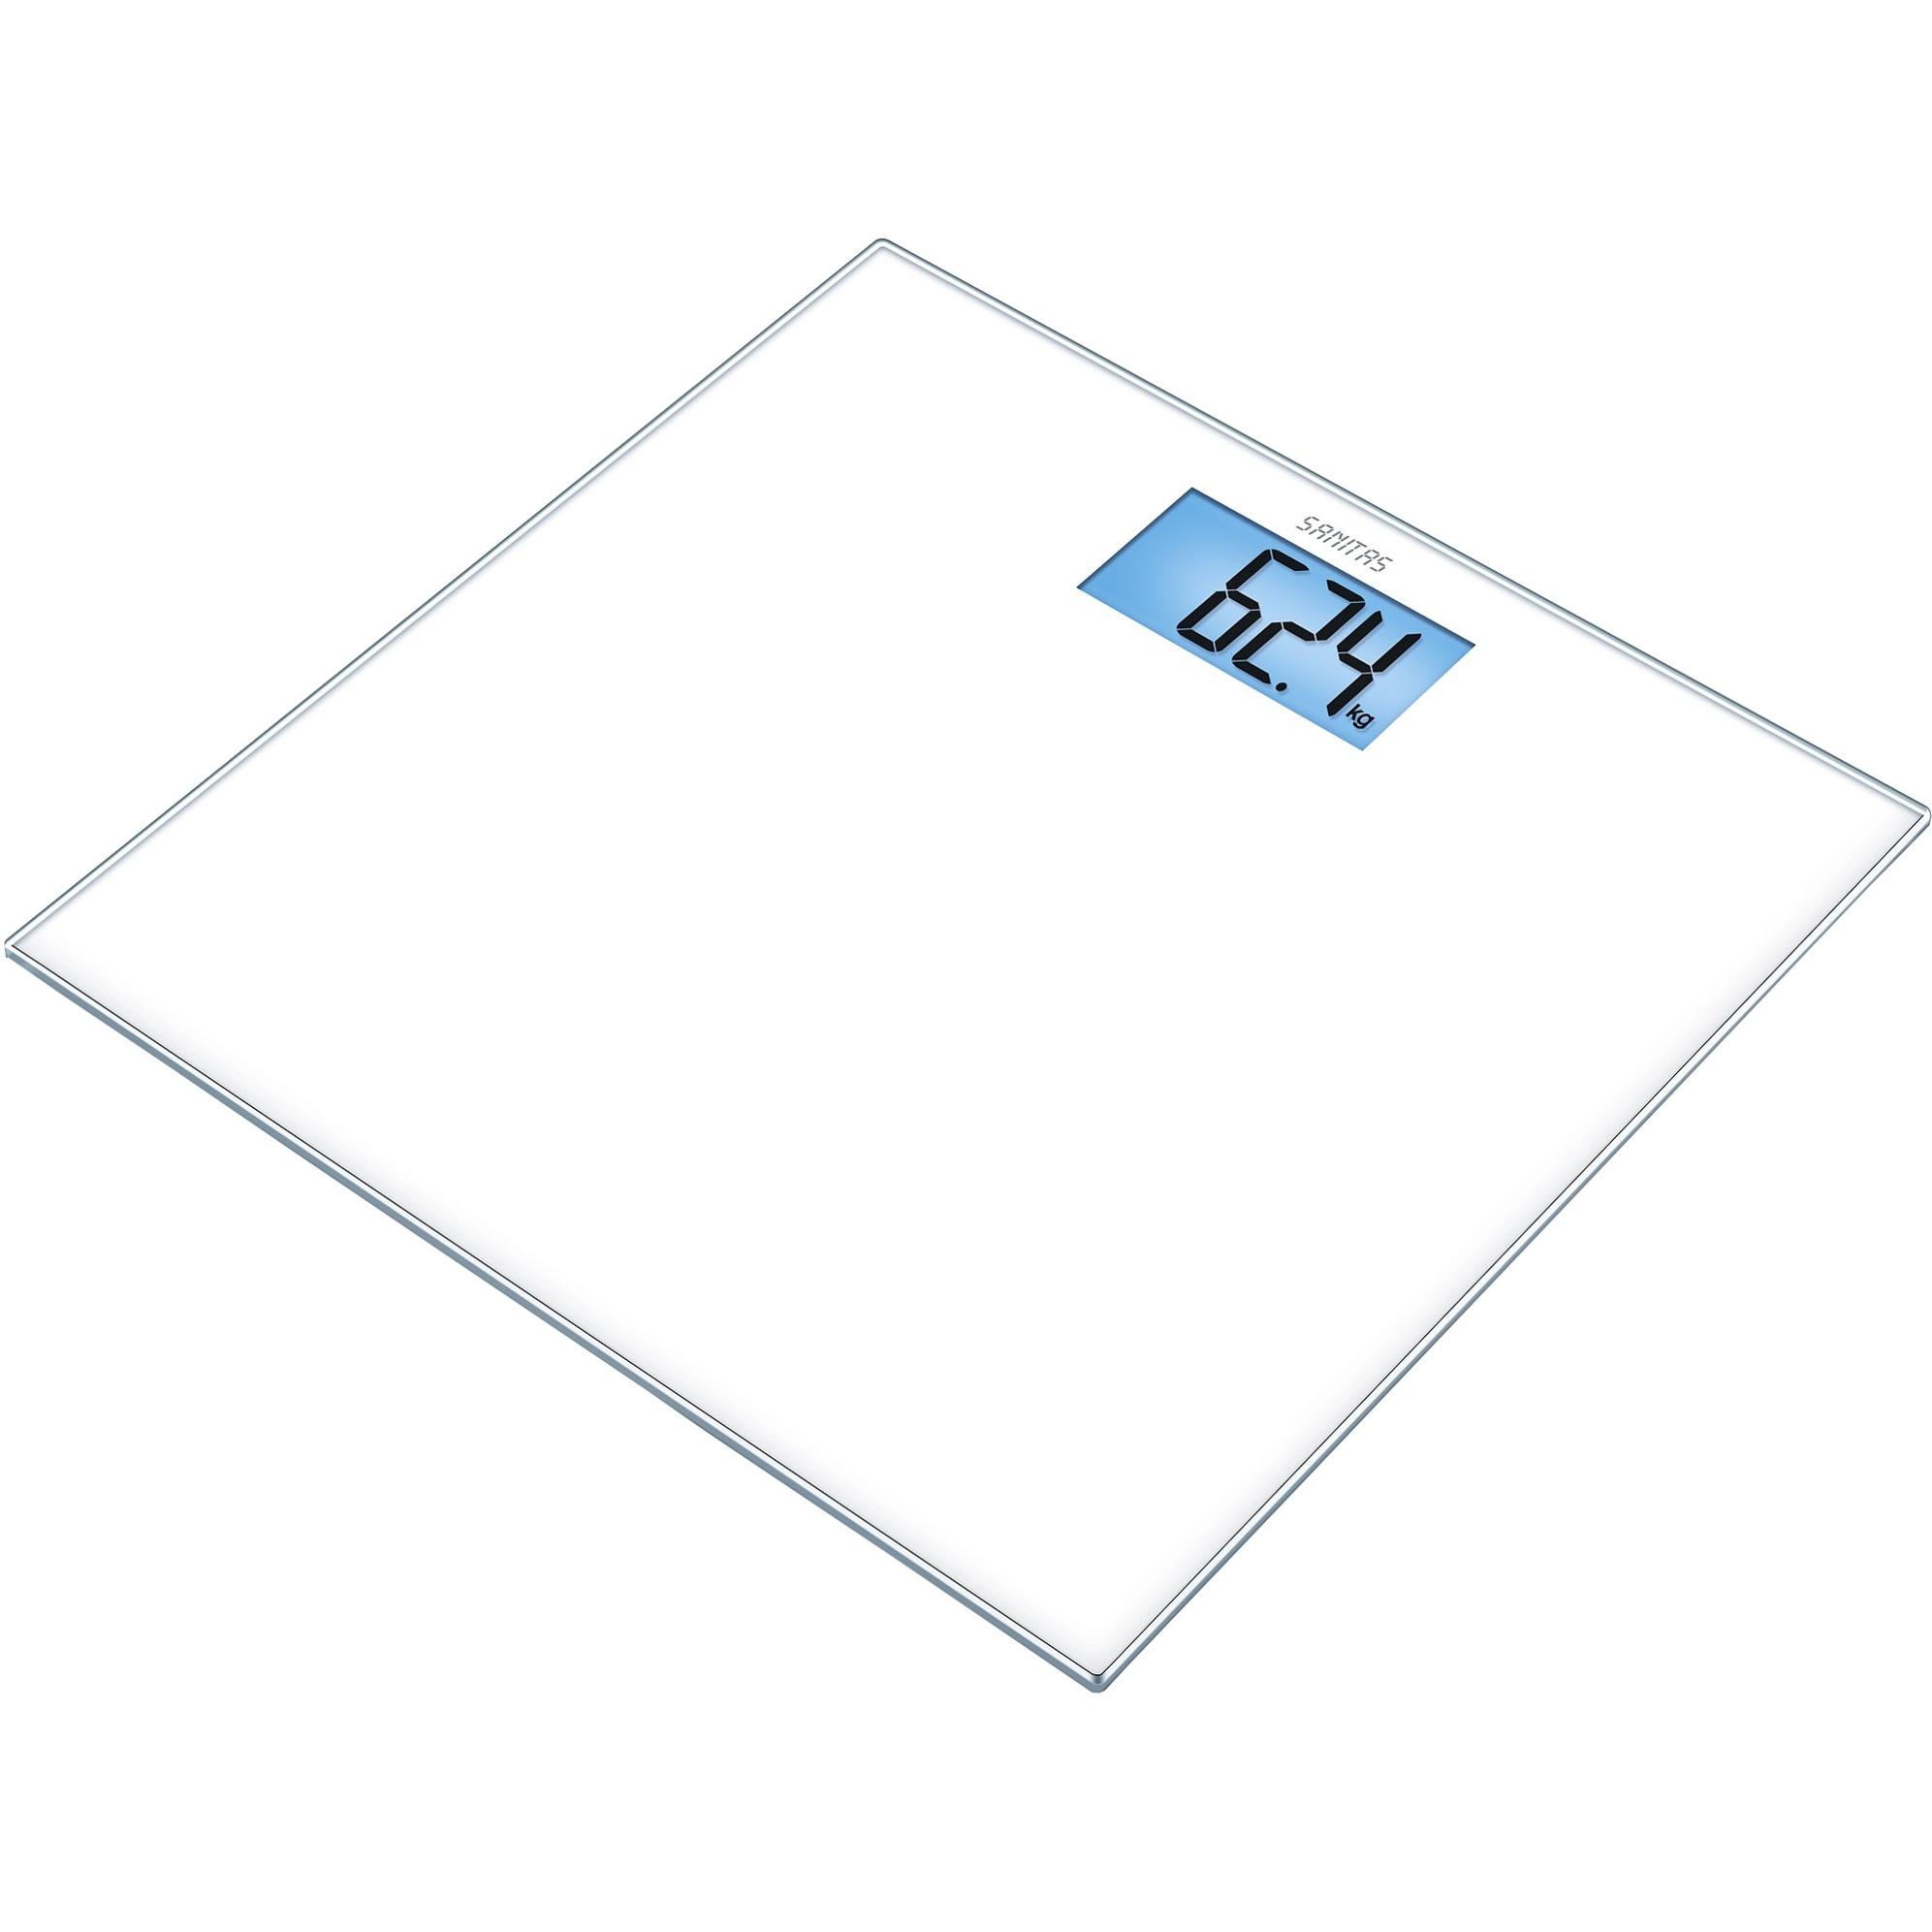 SGS 03 Báscula personal electrónica Blanco, Balanza